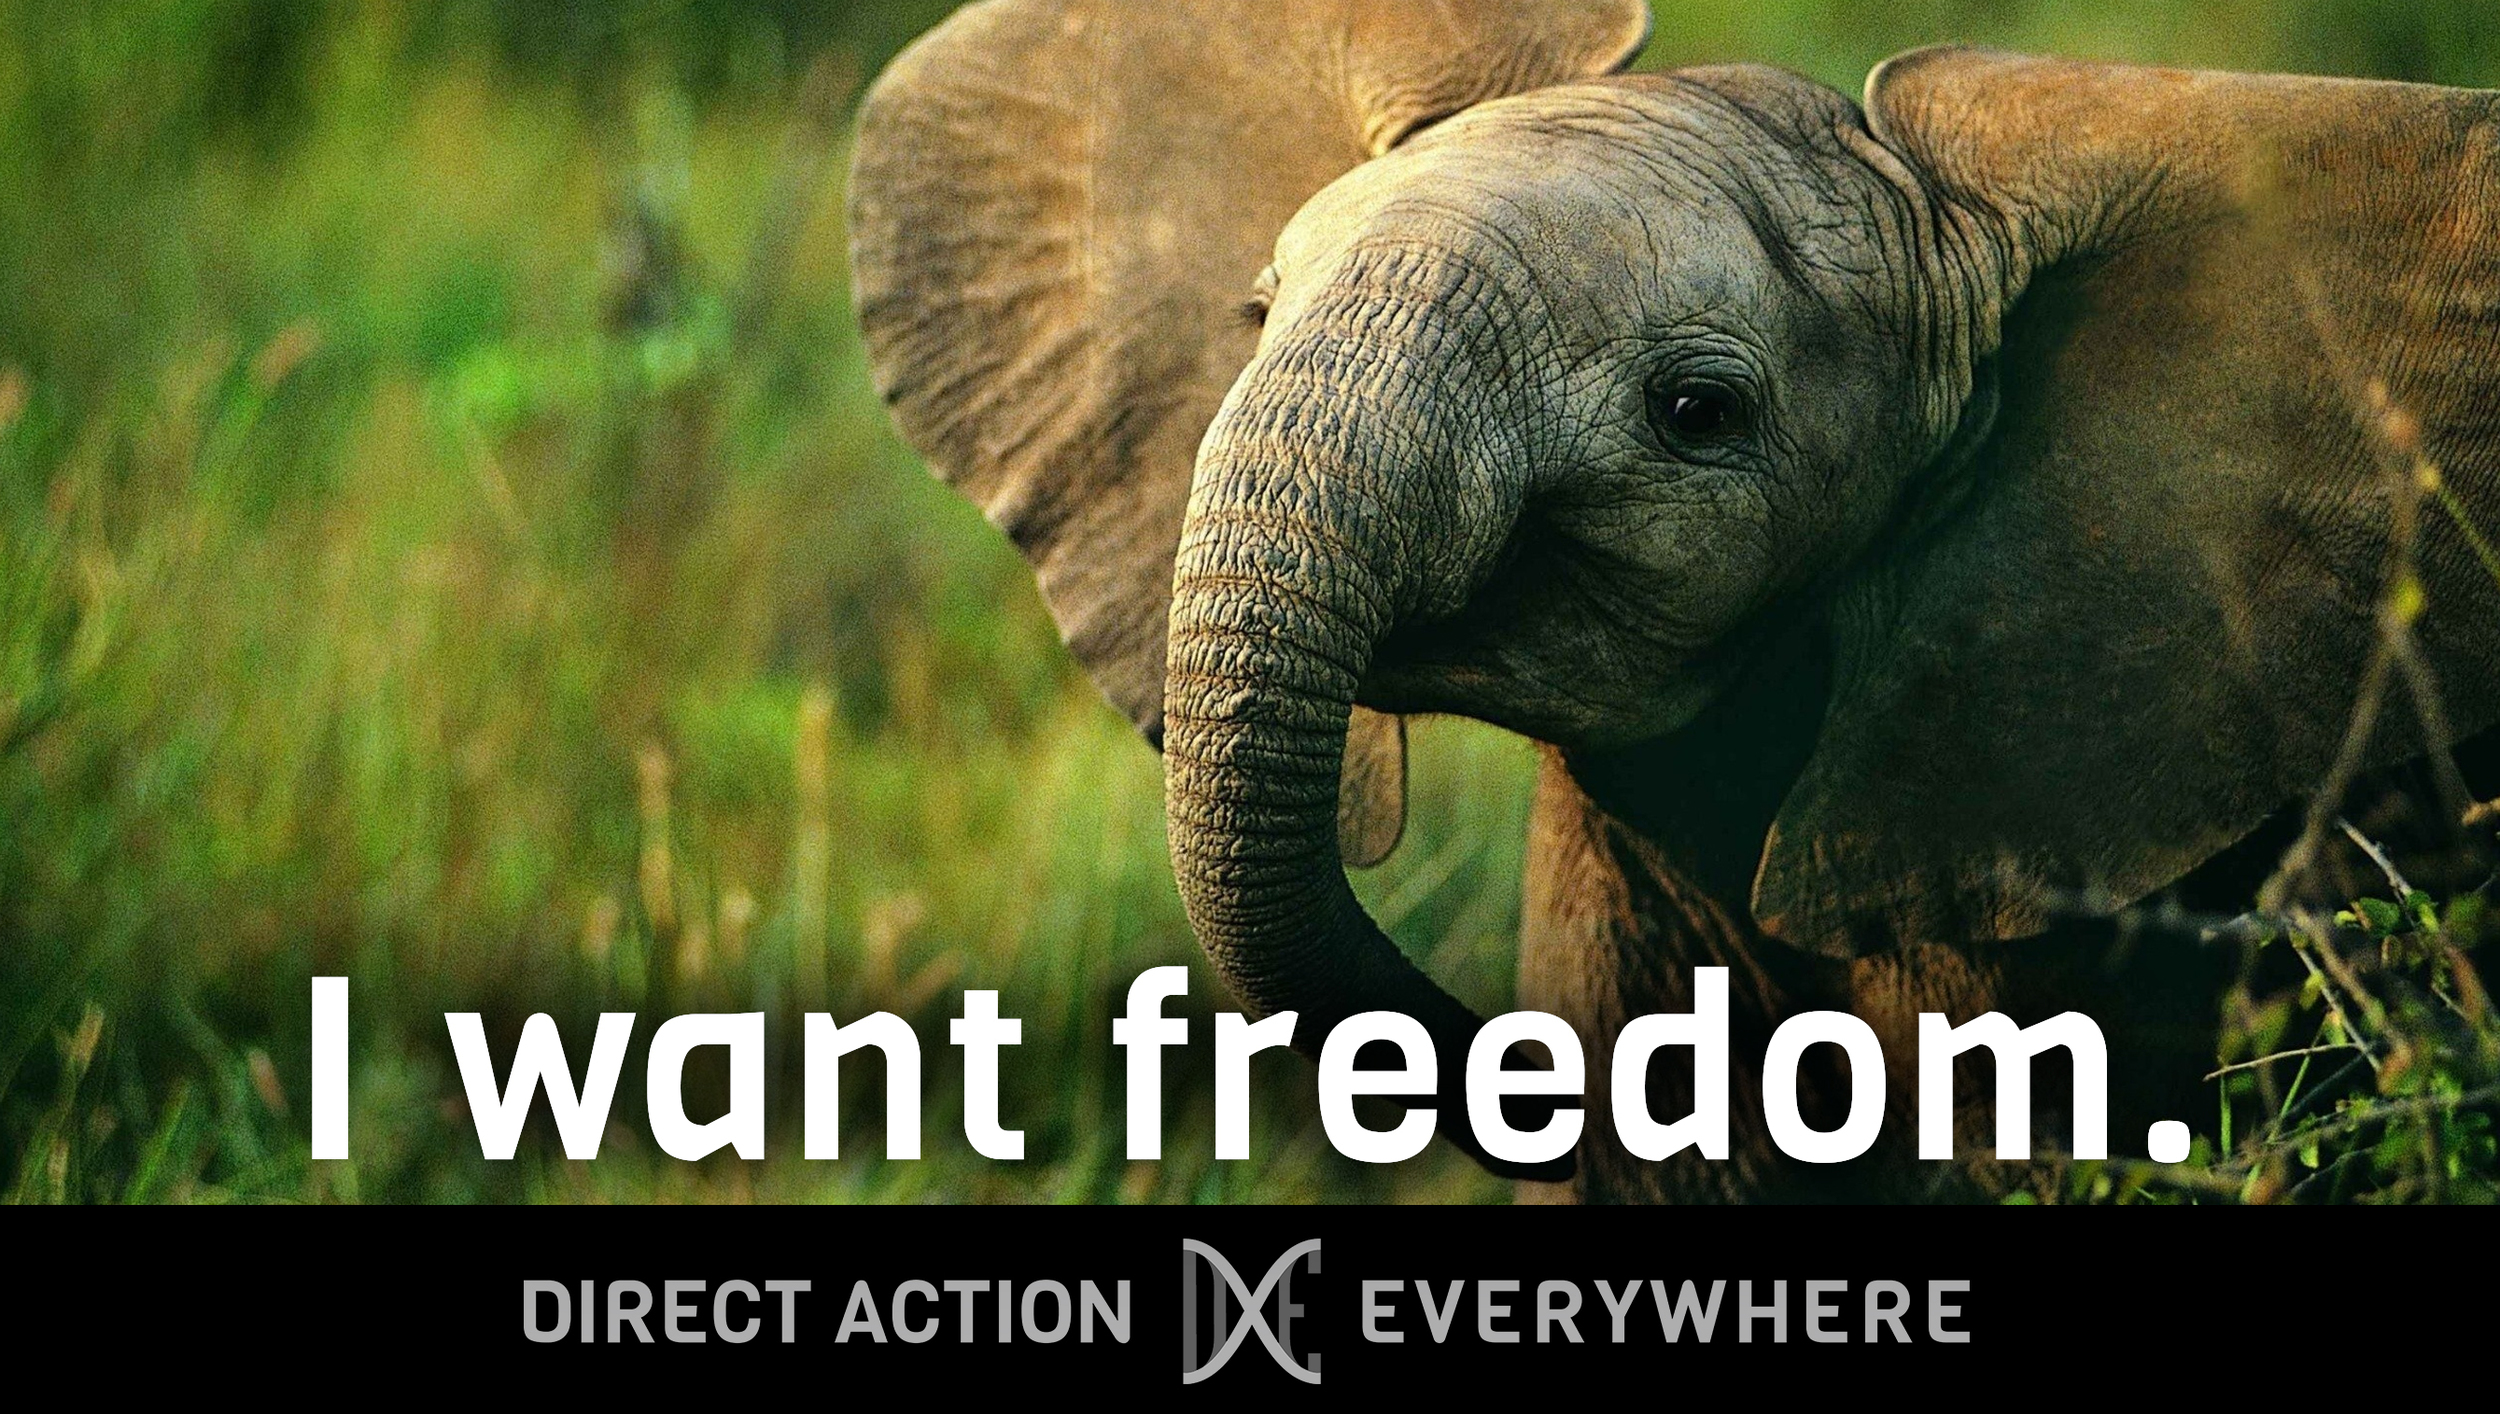 iwantfreedom_elephantbaby2.jpg